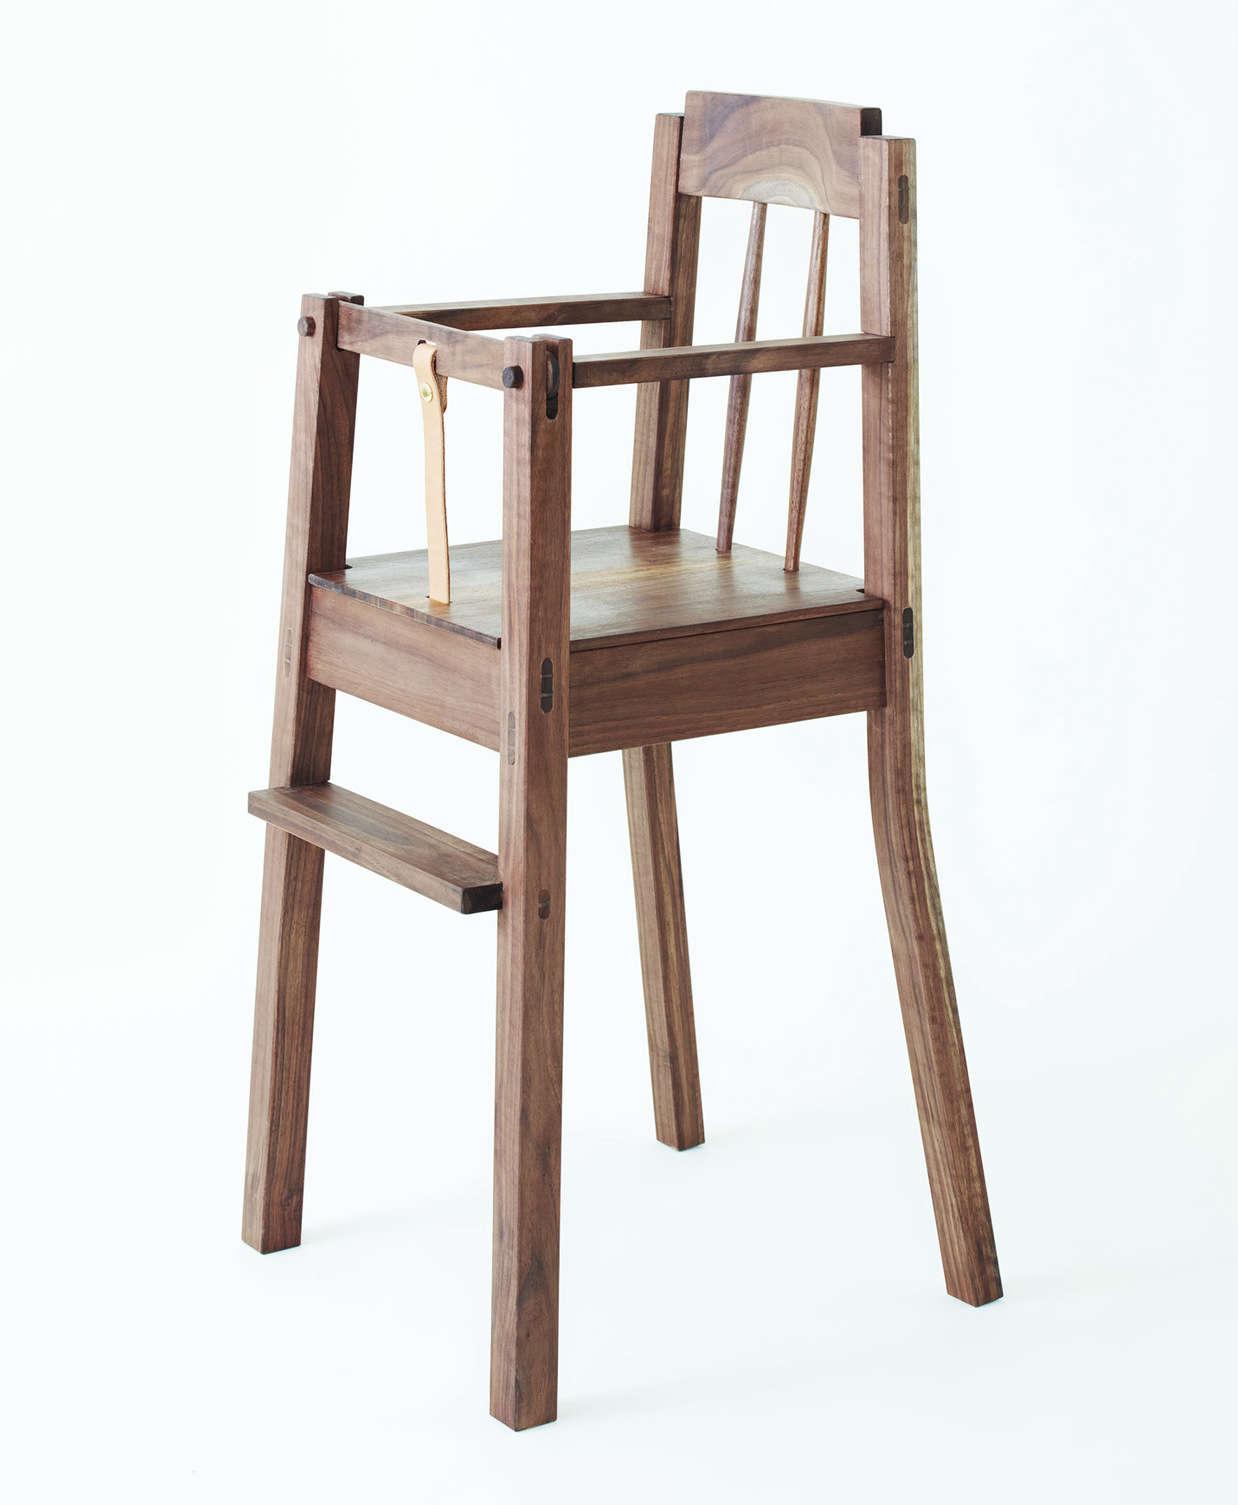 Hudson Workshop Heirloom Wood Furniture From A Hungarian